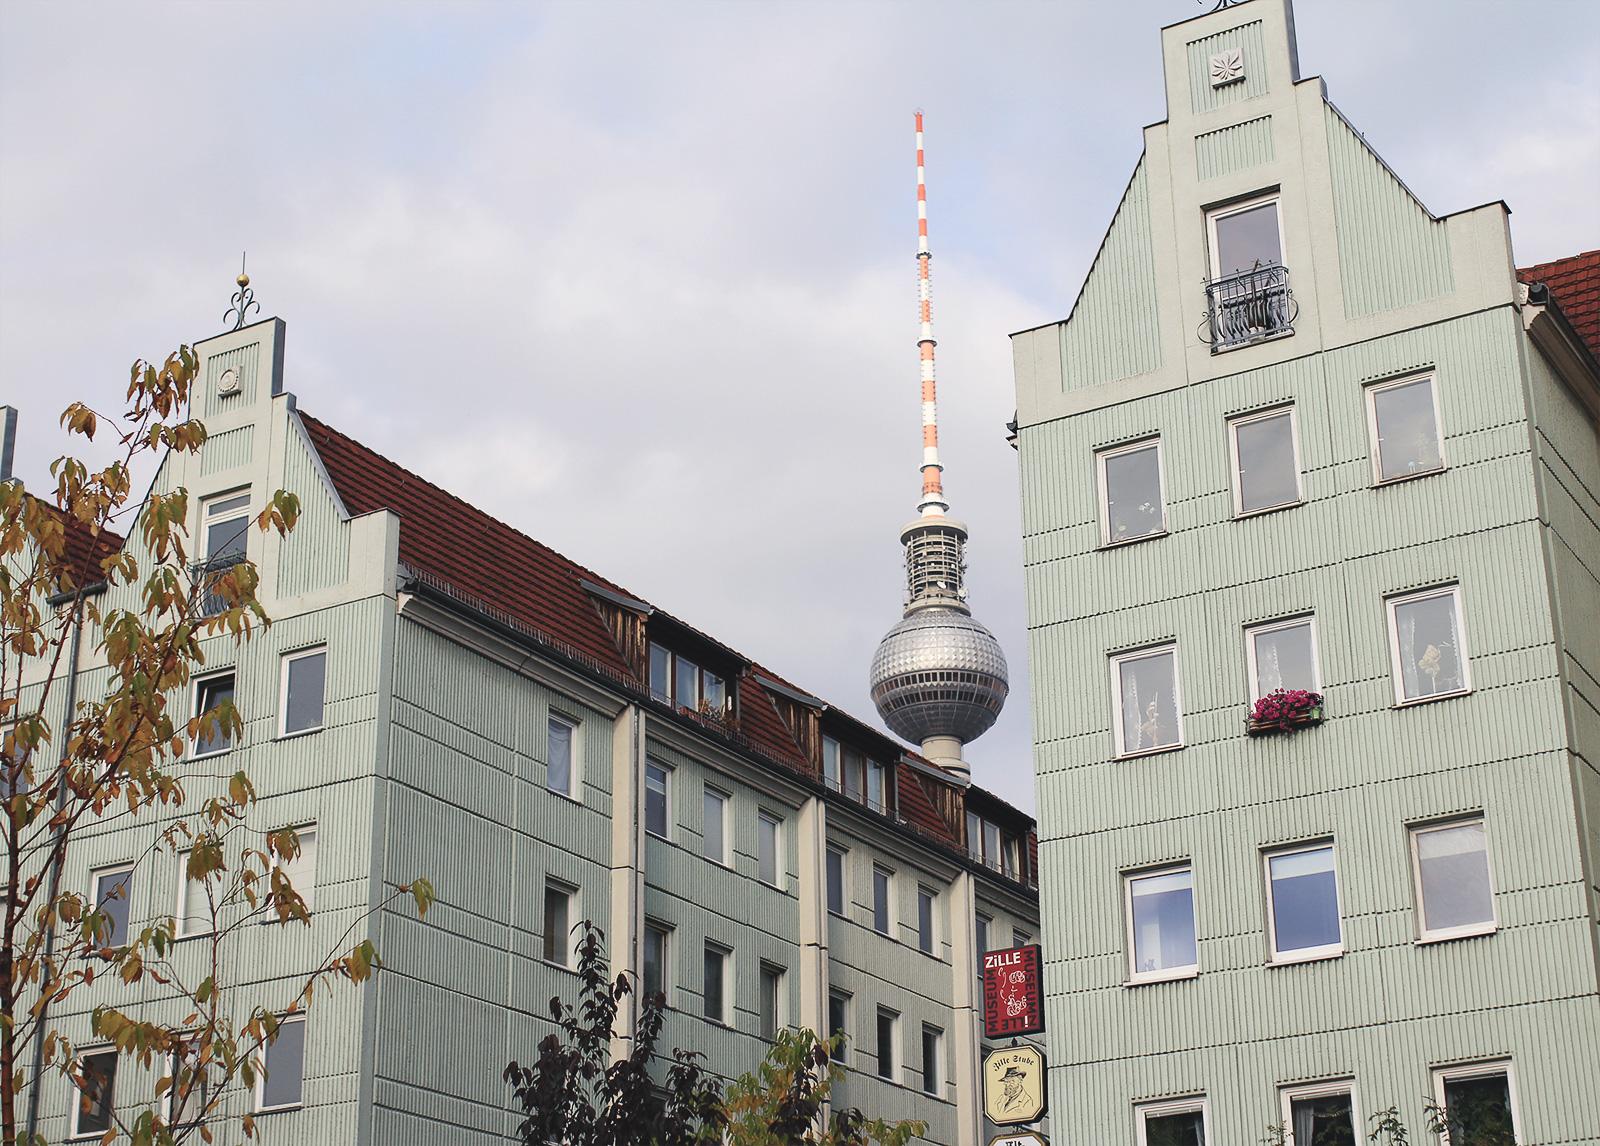 berlin-14okt-02